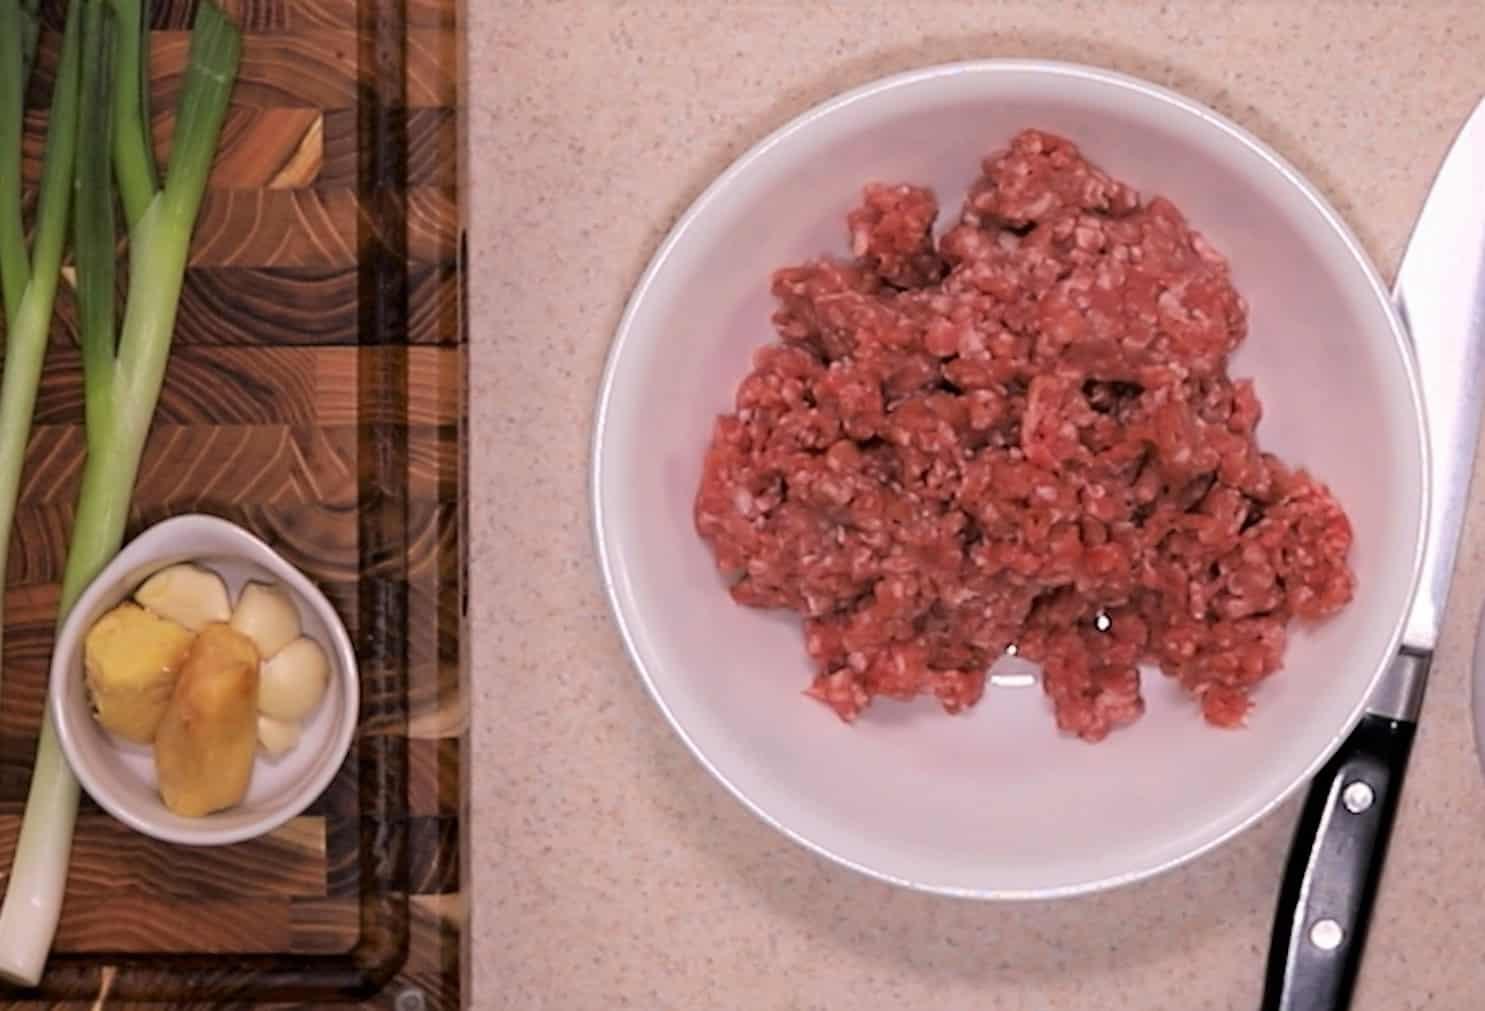 Low Carb Wonton Soup Starts with Ground Pork